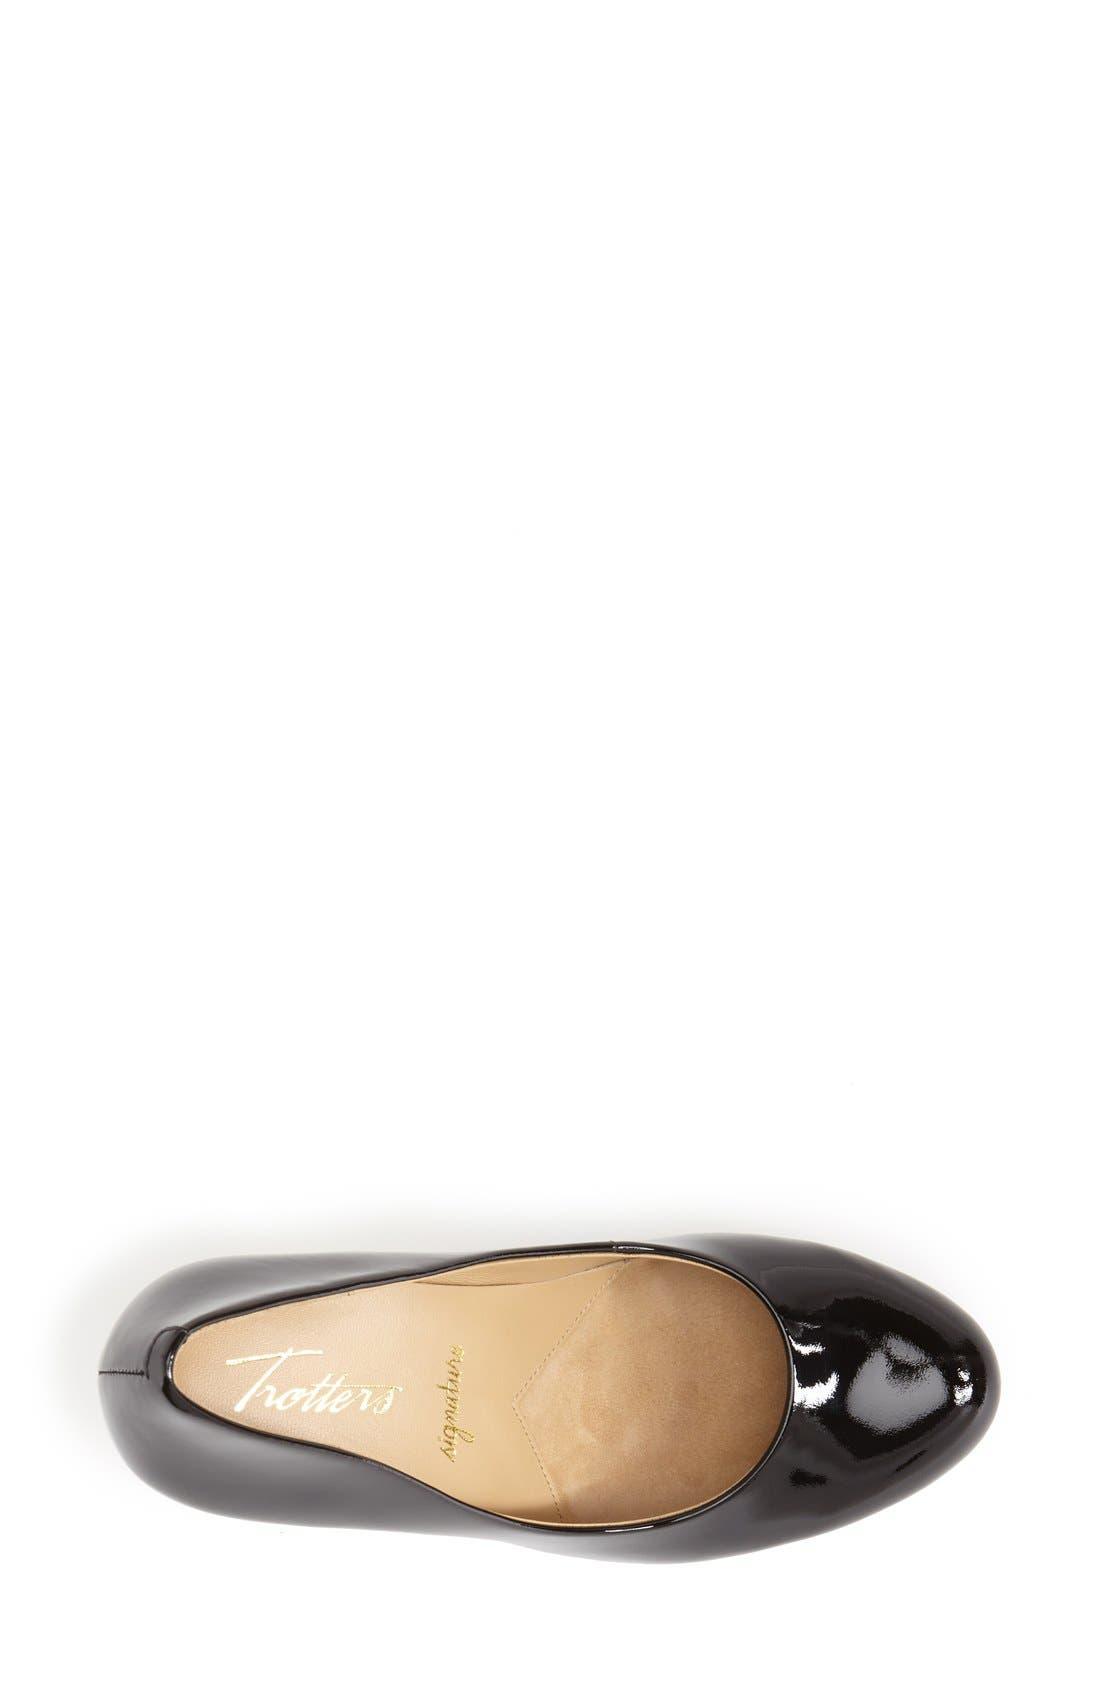 'Signature Gigi' Round Toe Pump,                             Alternate thumbnail 2, color,                             BLACK PATENT